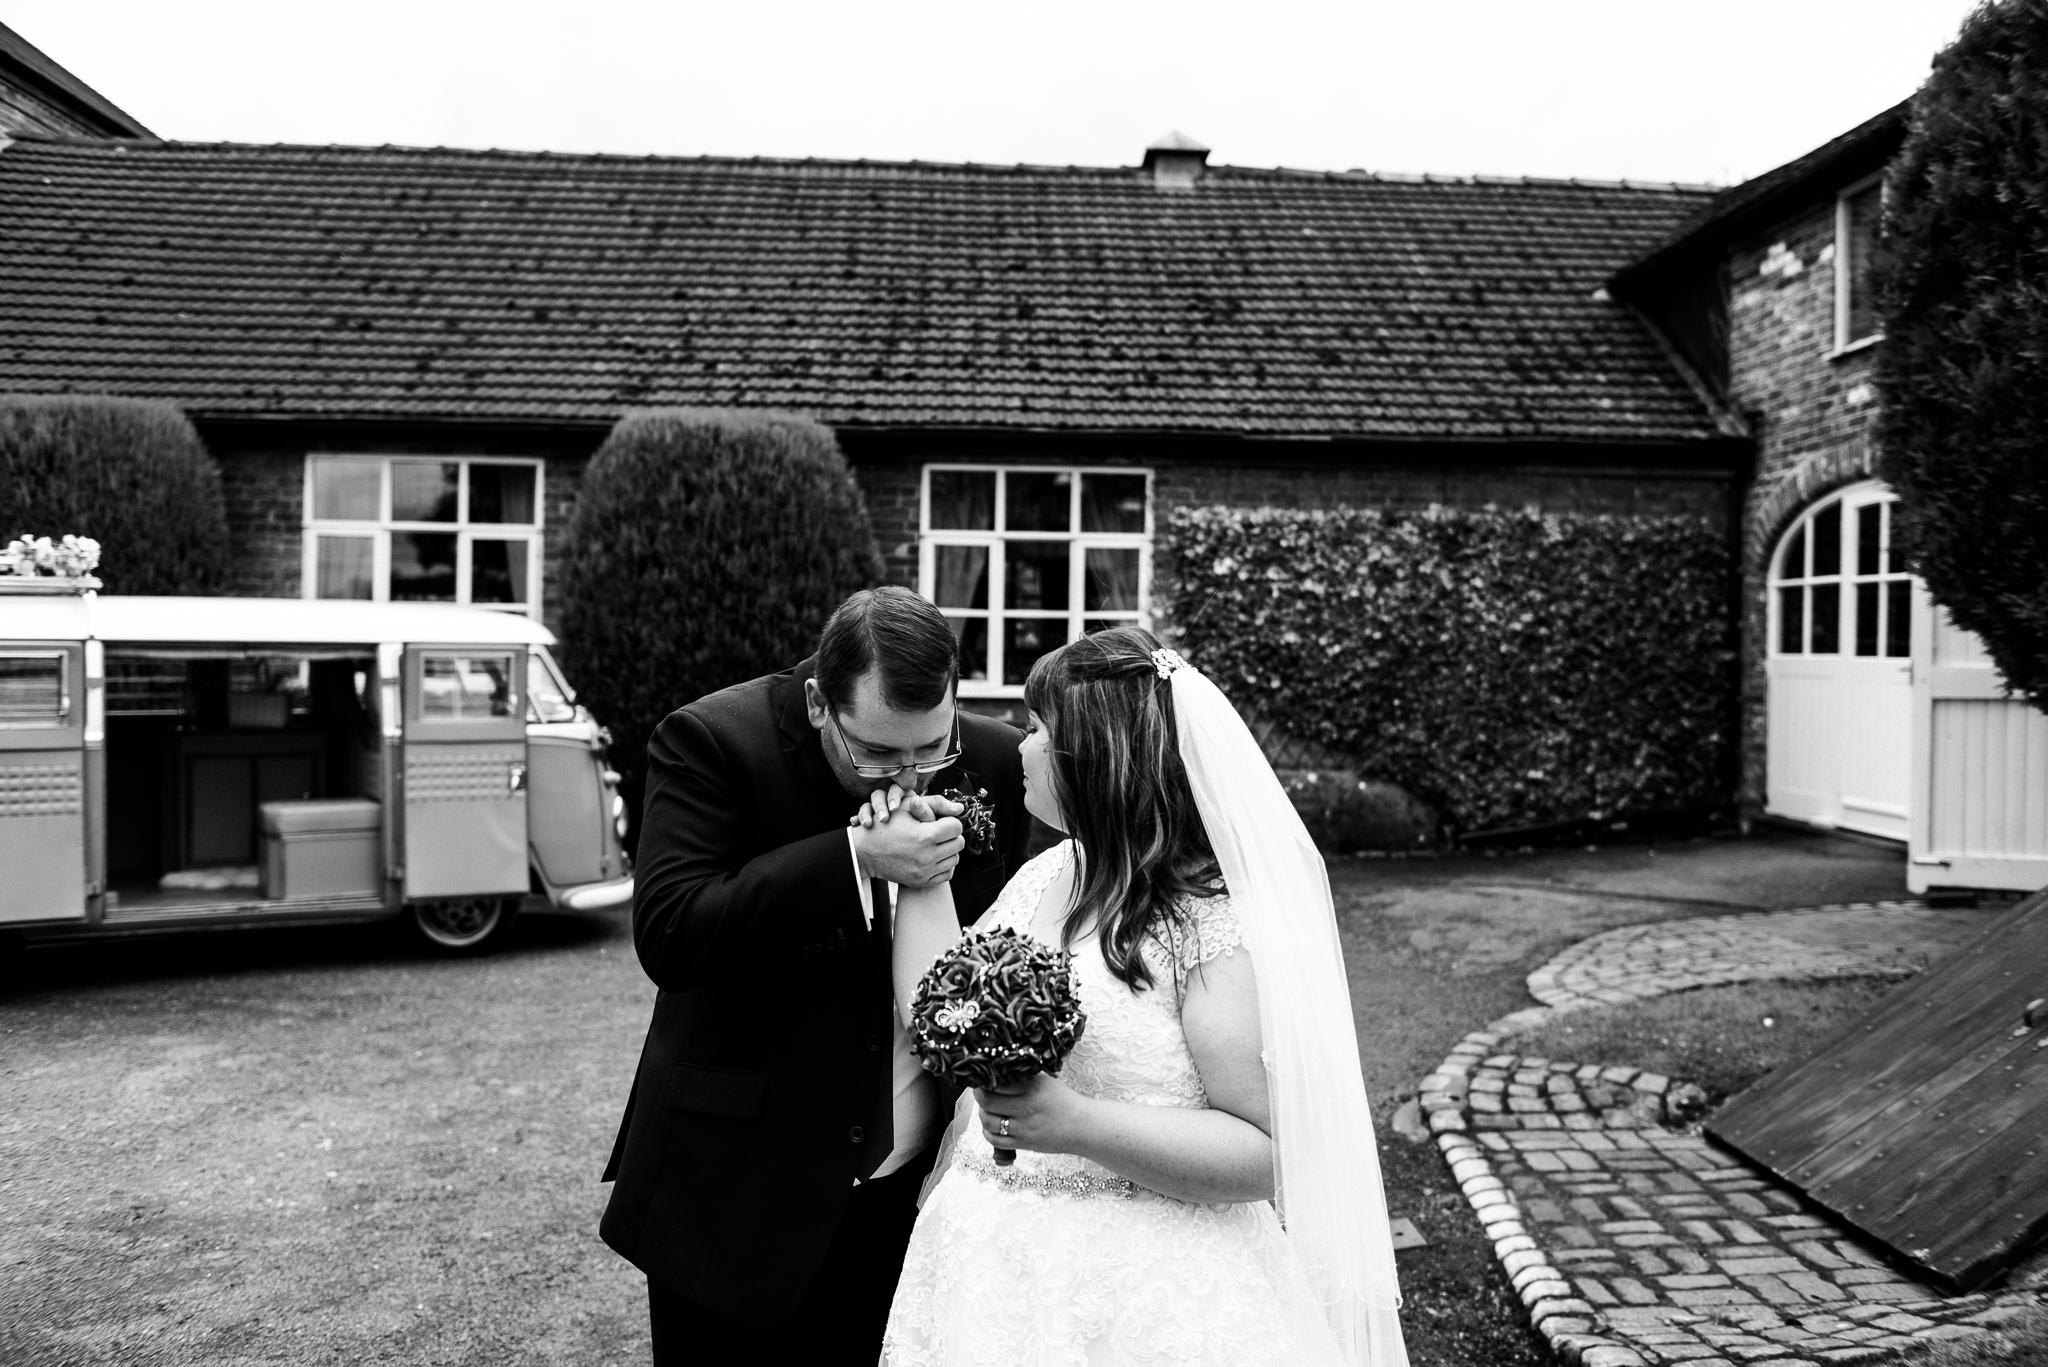 Geek Lego Wedding at Slater's County Inn, Baldwin's Gate, Staffordshire-28.jpg